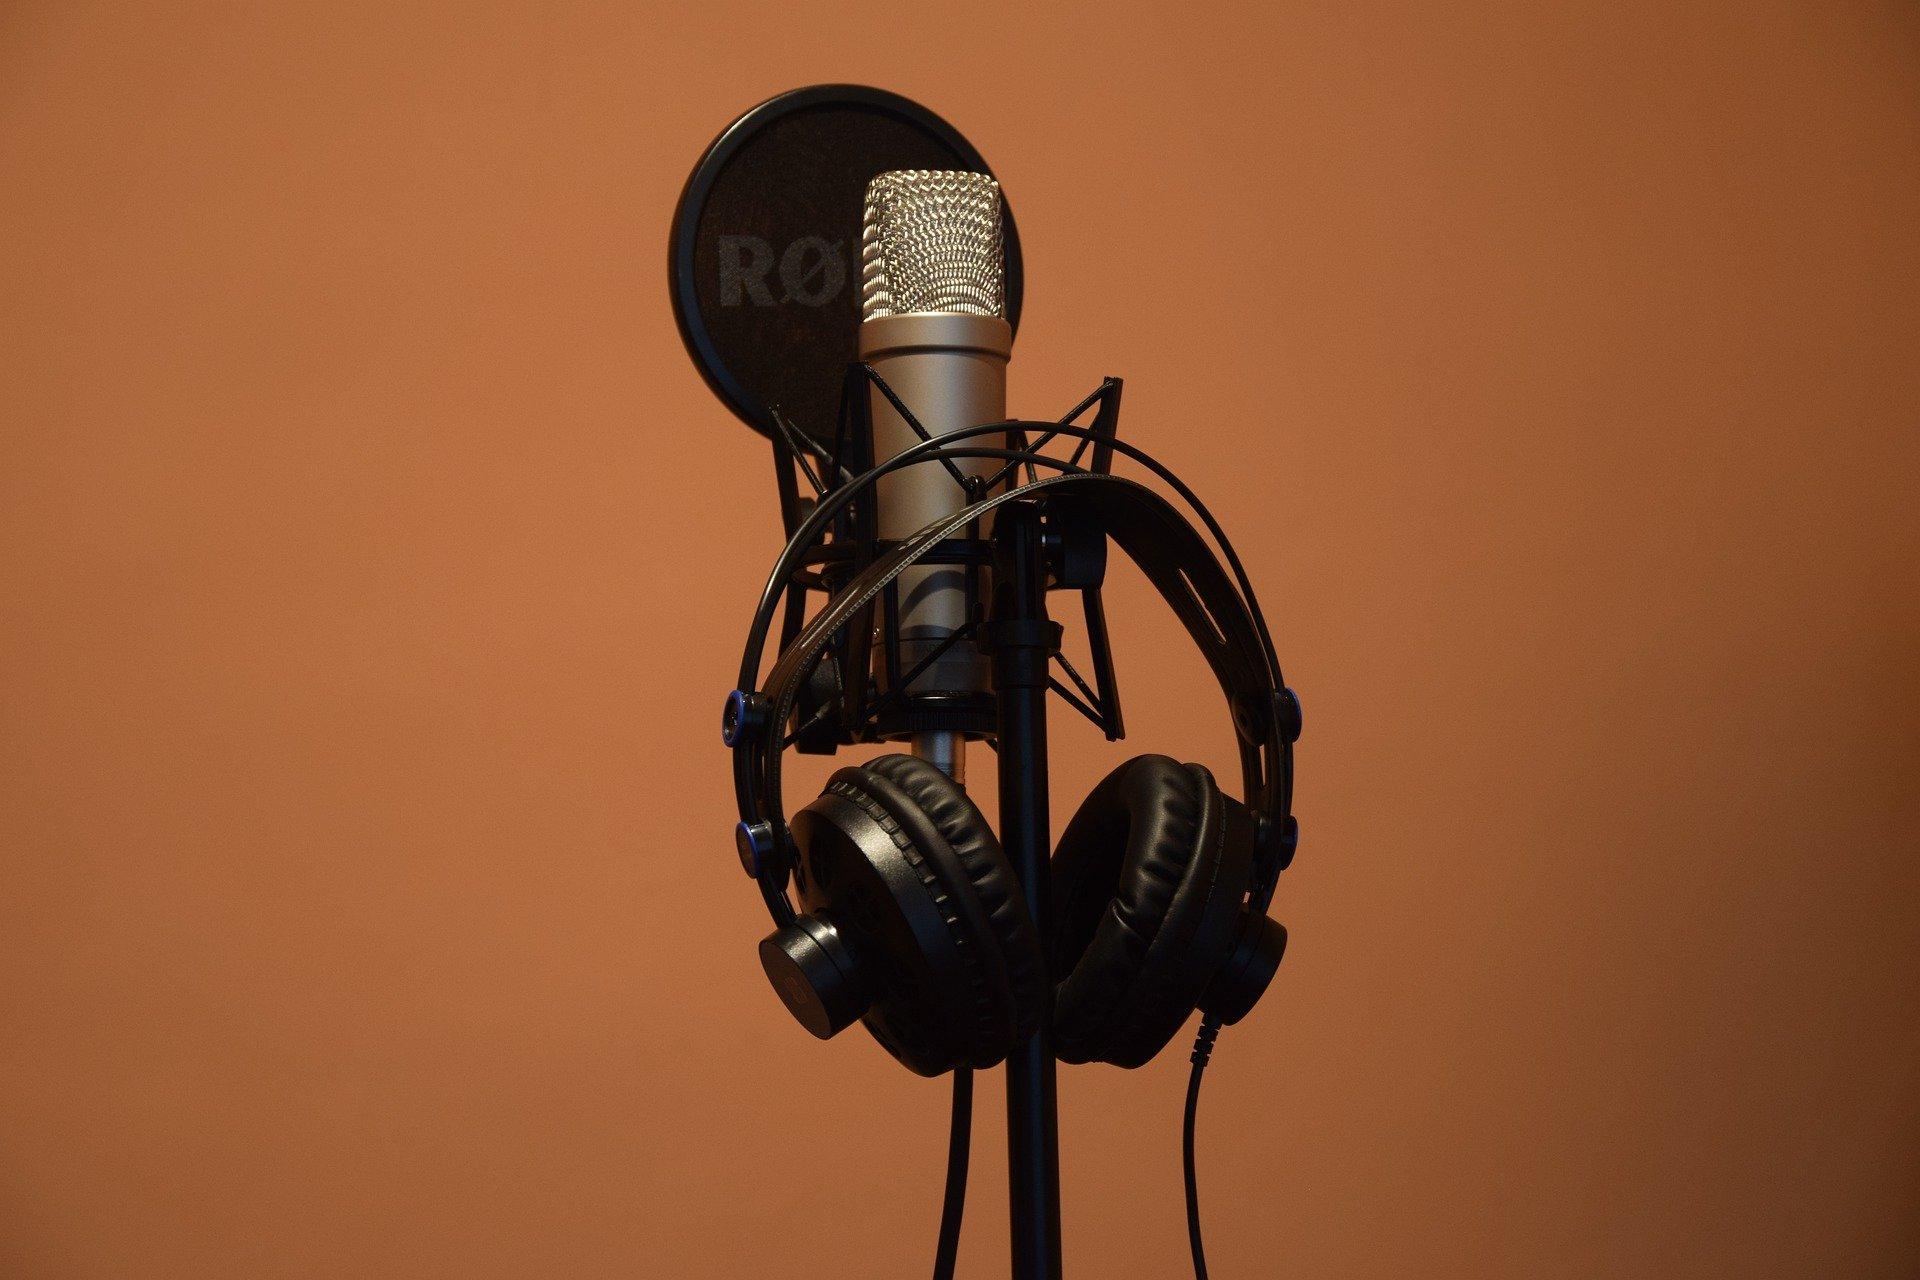 Movie Stuidoで動画に音声を入れるには?主な機能や使い方も一挙紹介!